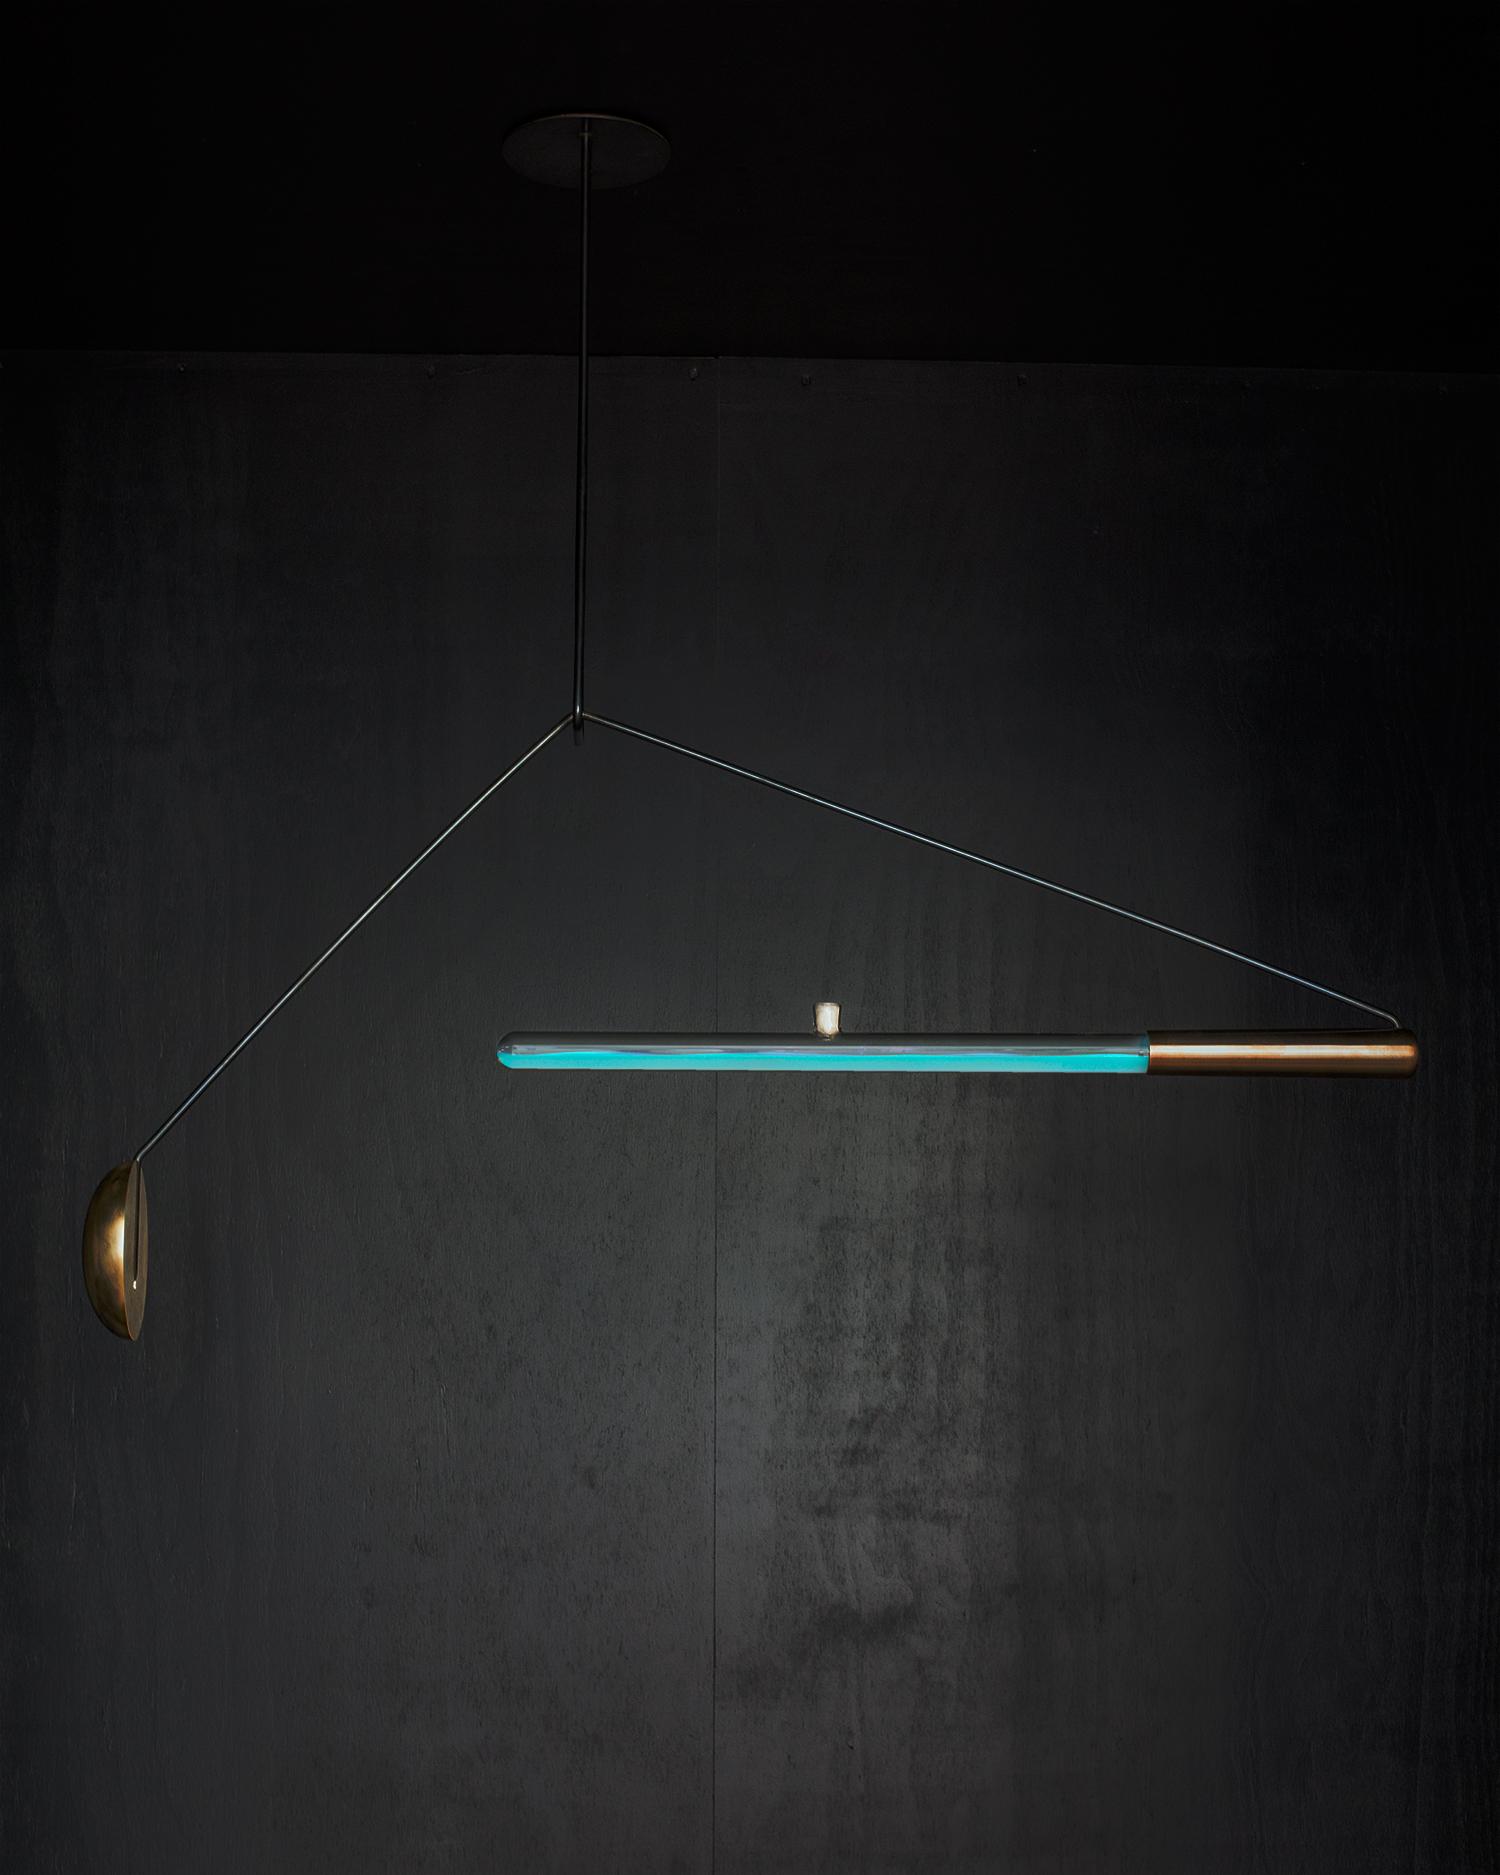 Ambio: Lampe mit bioluminiszierenden Bakterien (Bildquelle: Teresa van Dongen)